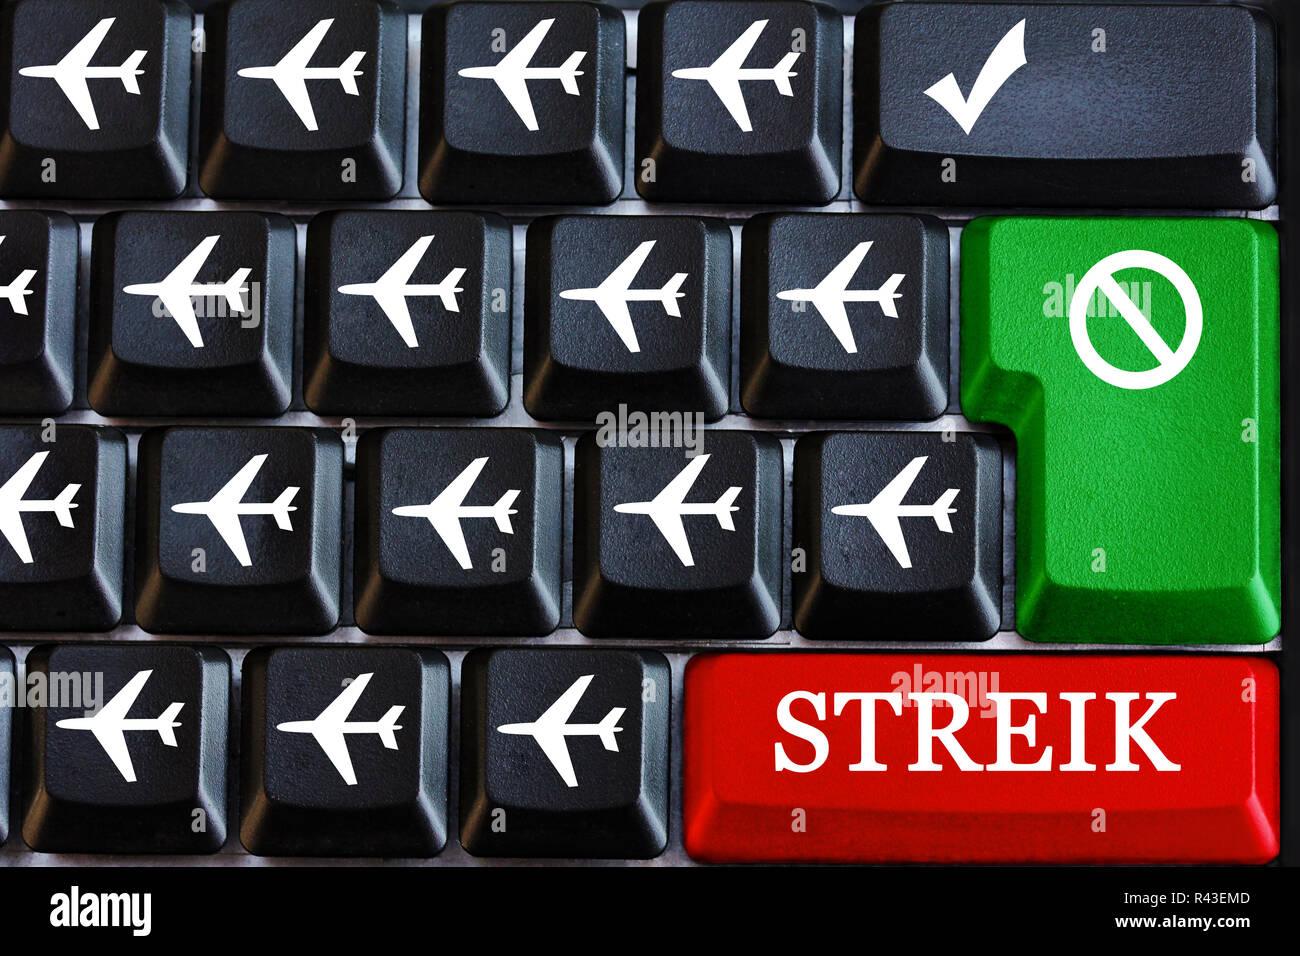 steik aviation - pilot strike - strike of flight attendants - Stock Image